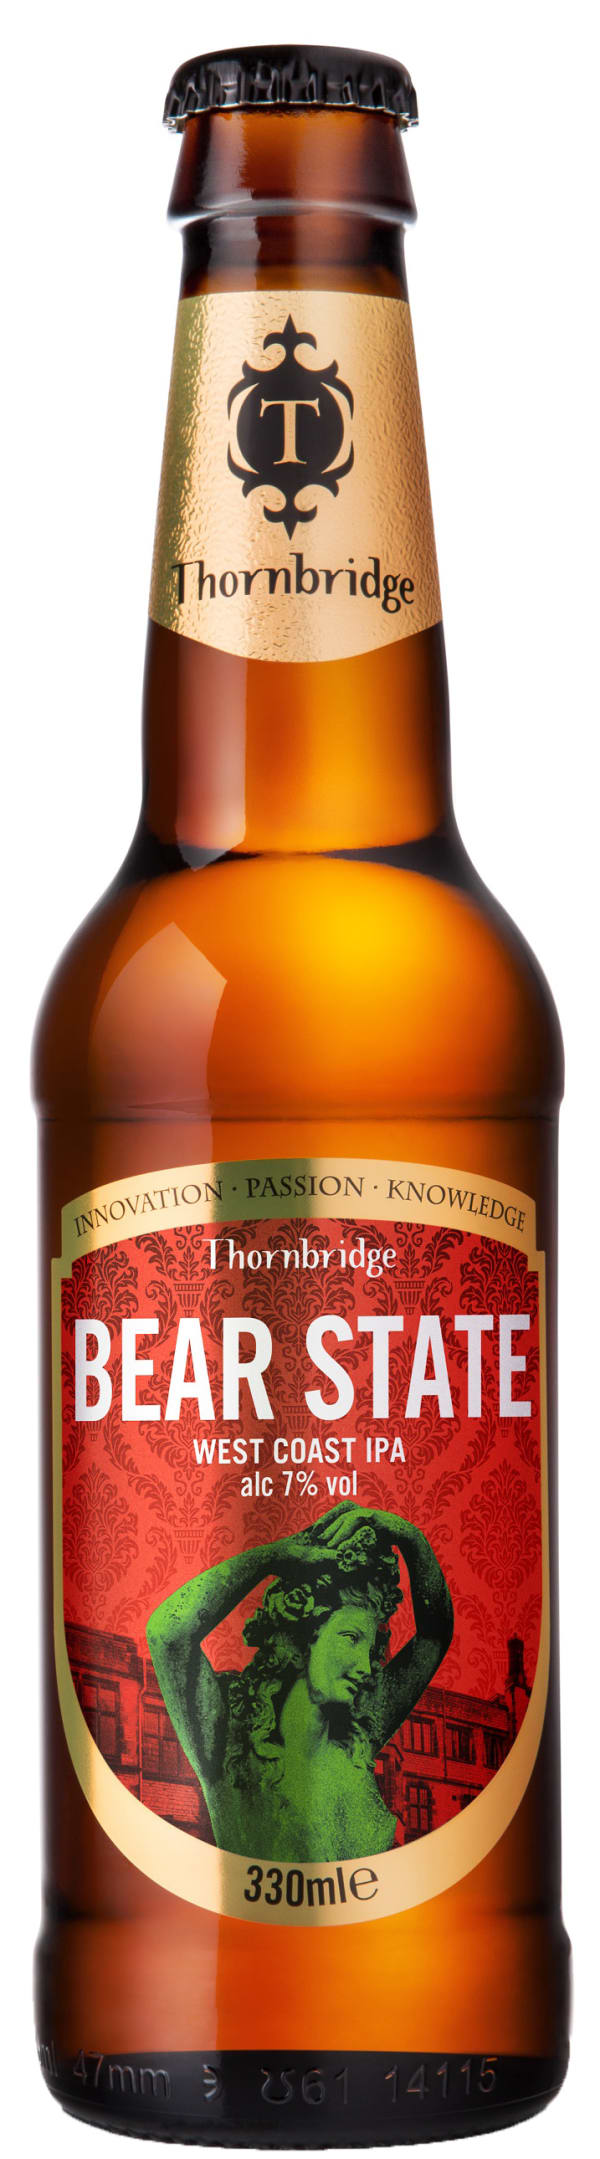 Thornbridge Bear State West Coast IPA